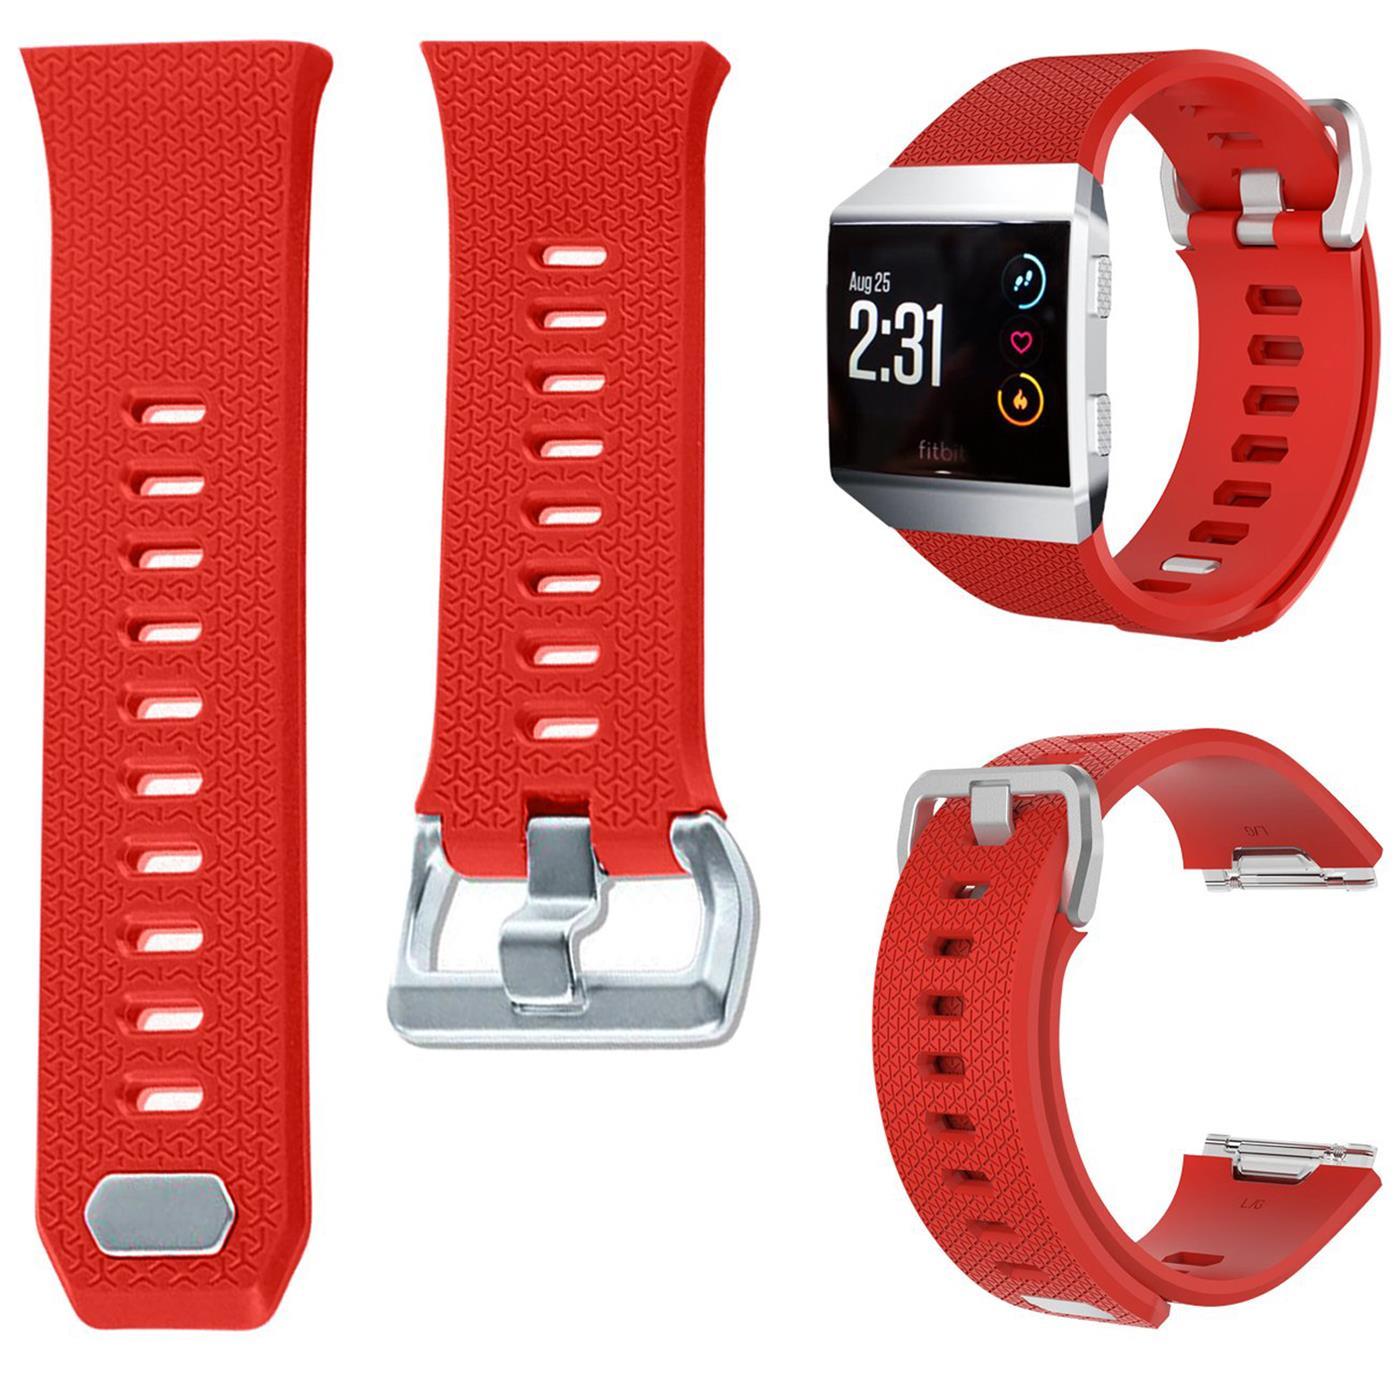 Fitbit-Ionic-Gr-S-L-Ersatz-Silikon-Armband-Uhren-Sport-Band-Fitness-Tracker Indexbild 21